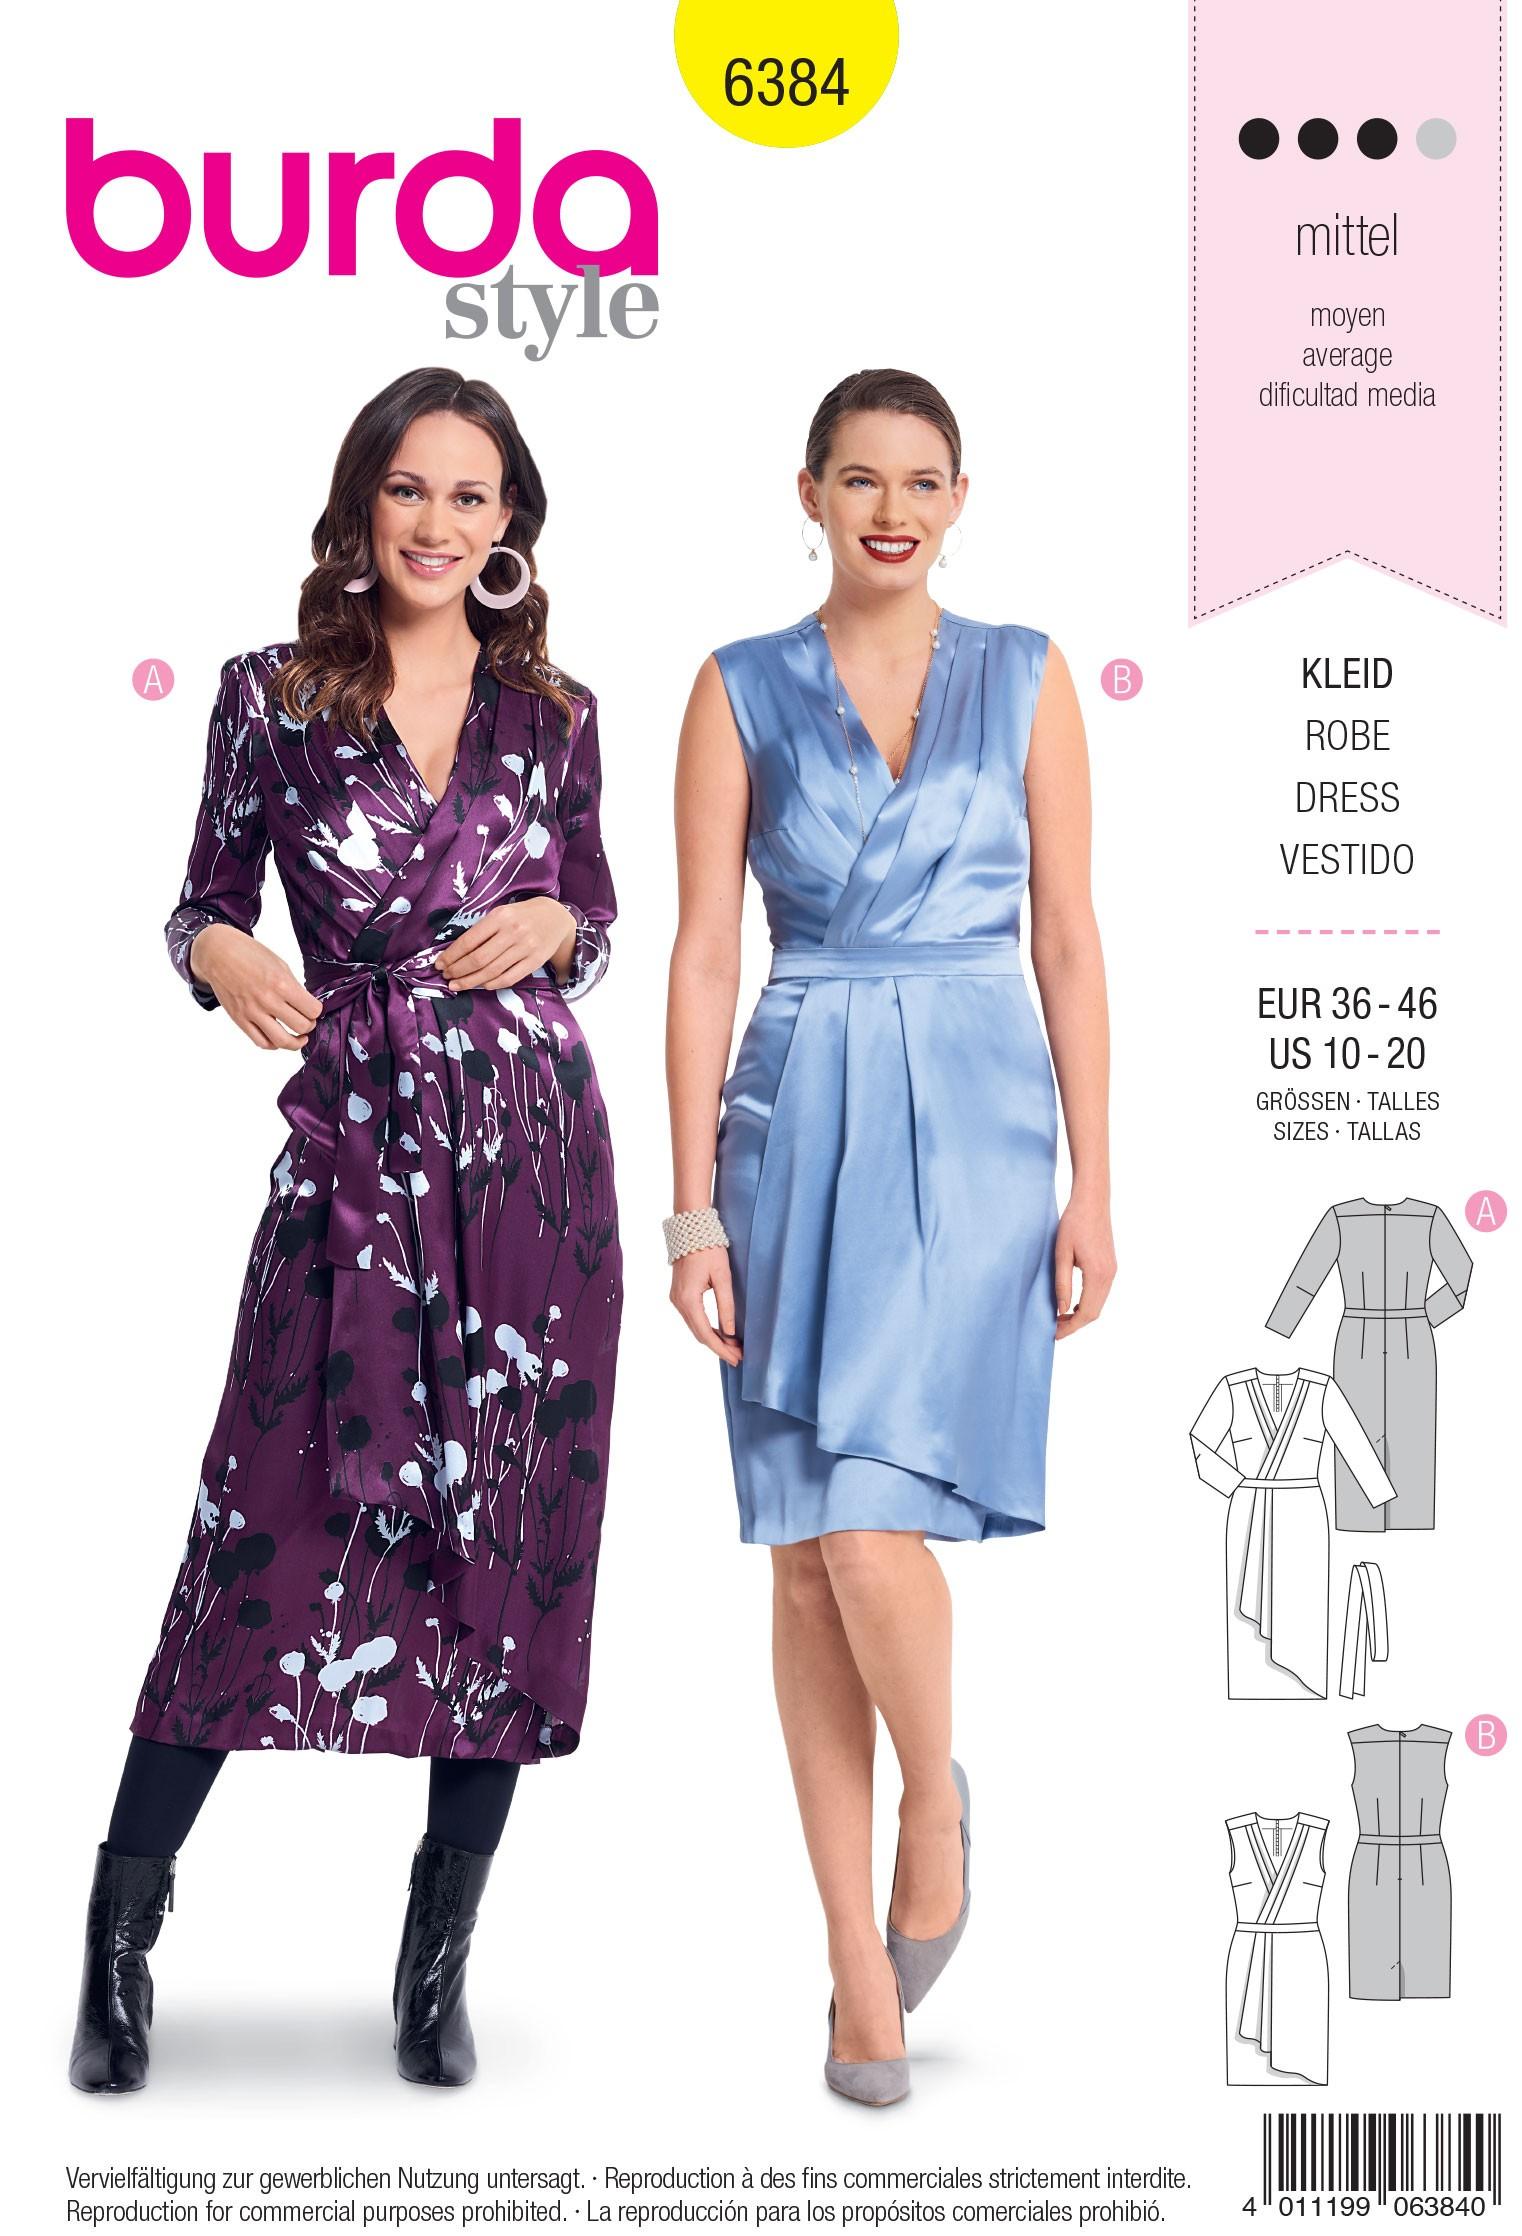 Burda Sewing Pattern 6384 Style Woman's Feminine Wrap Dress